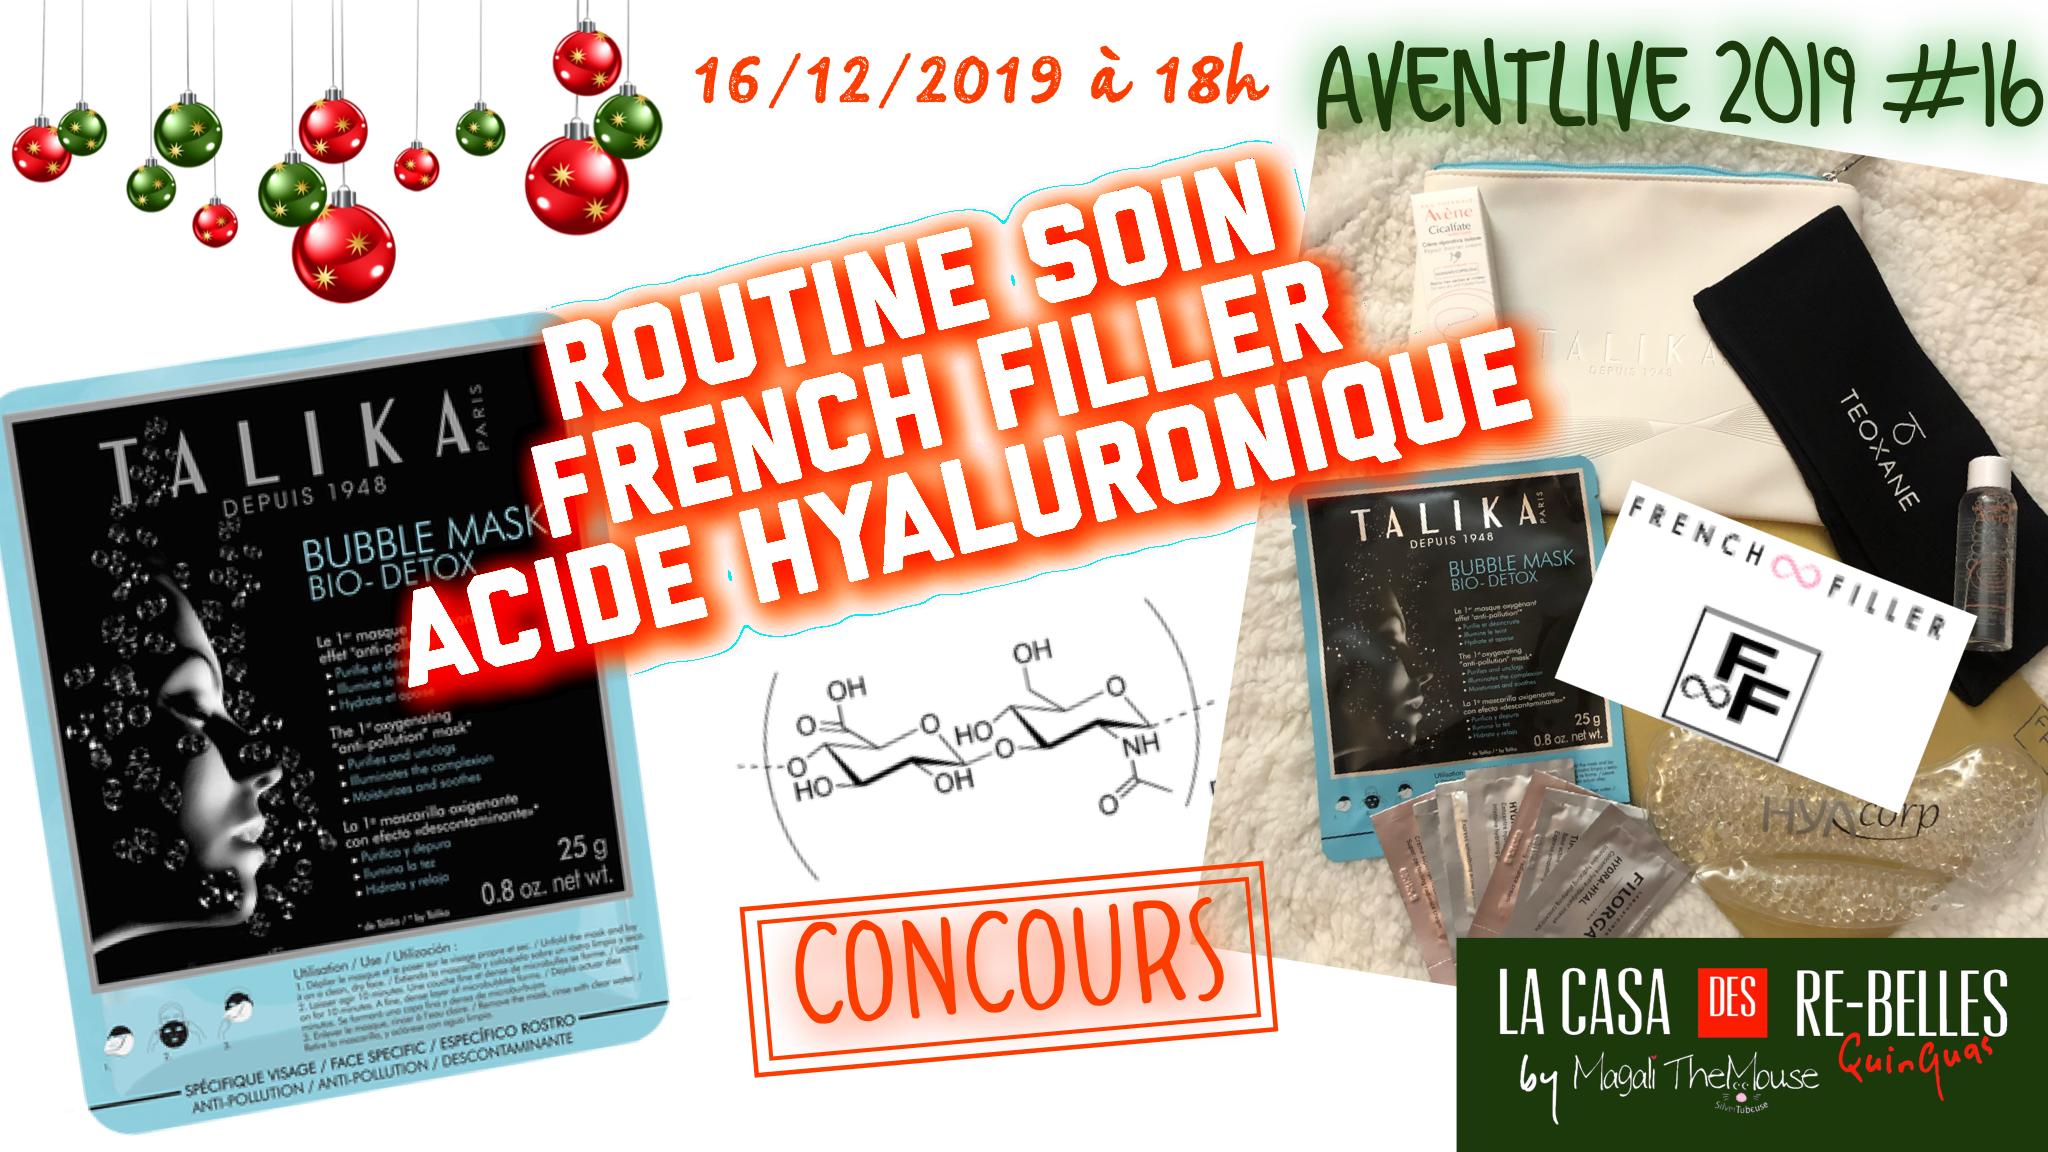 Routine du soir avec French Filler… on parle d'acide hyaluronique!